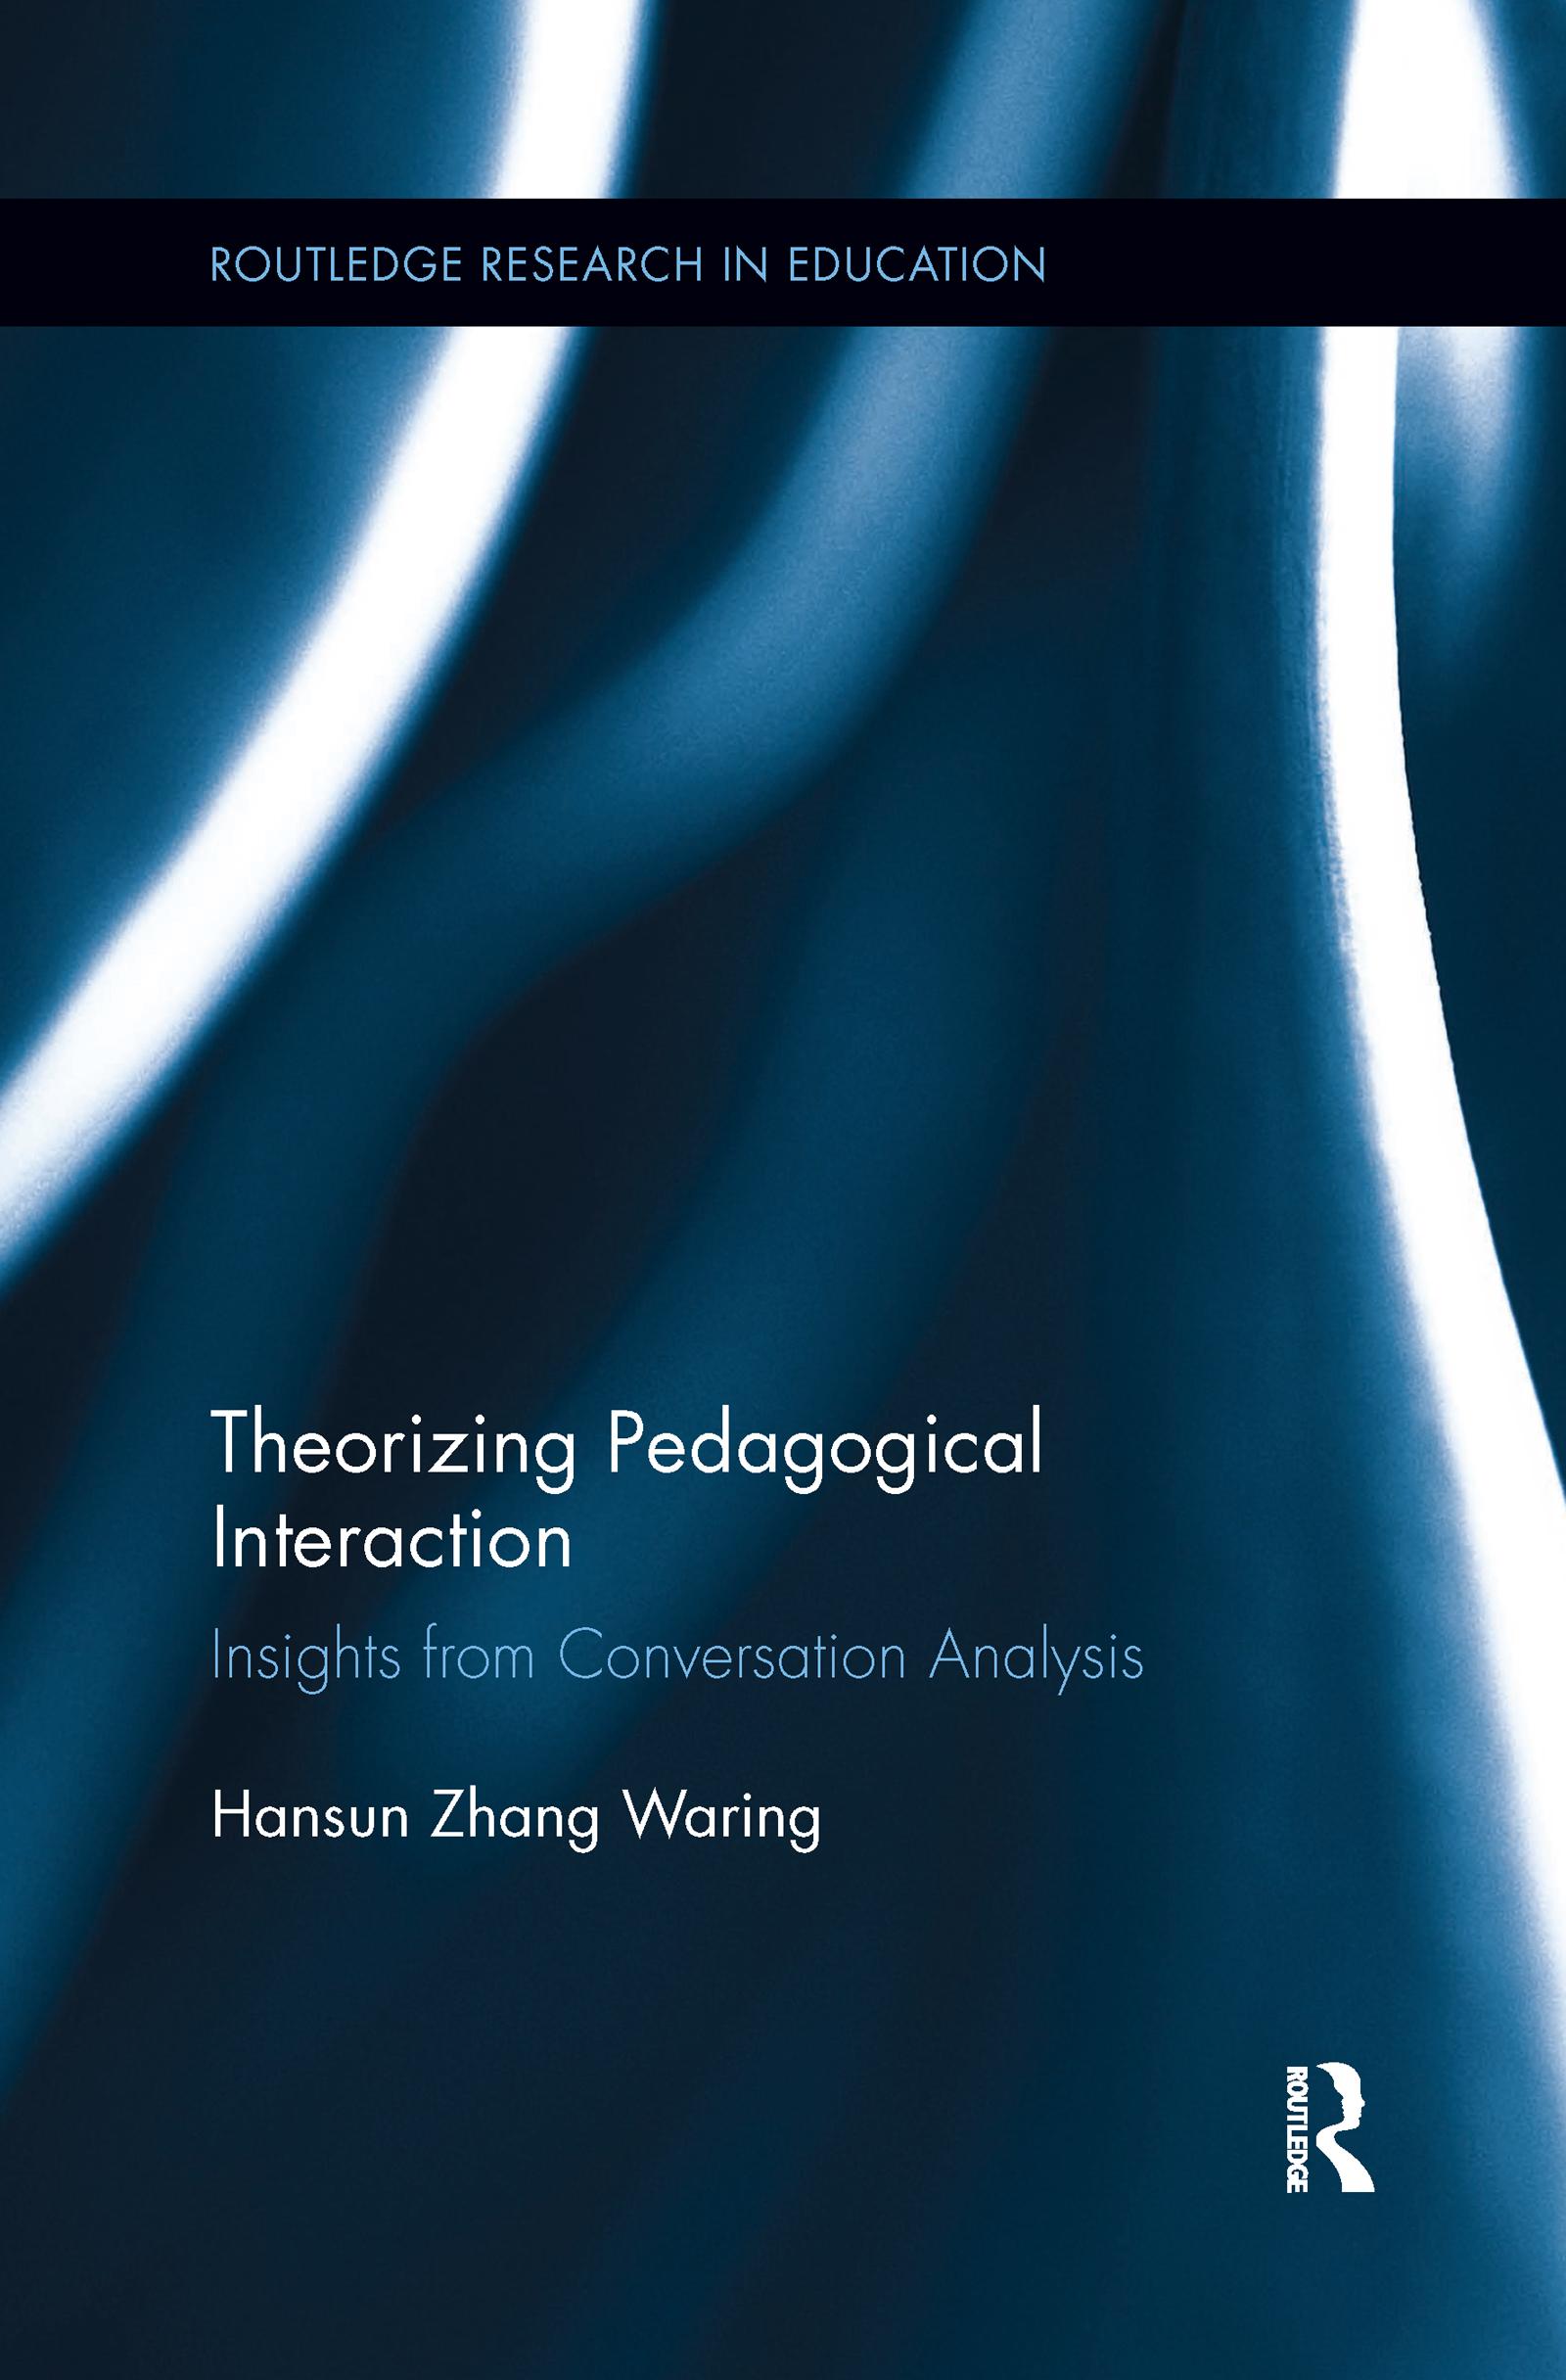 Theorizing Pedagogical Interaction